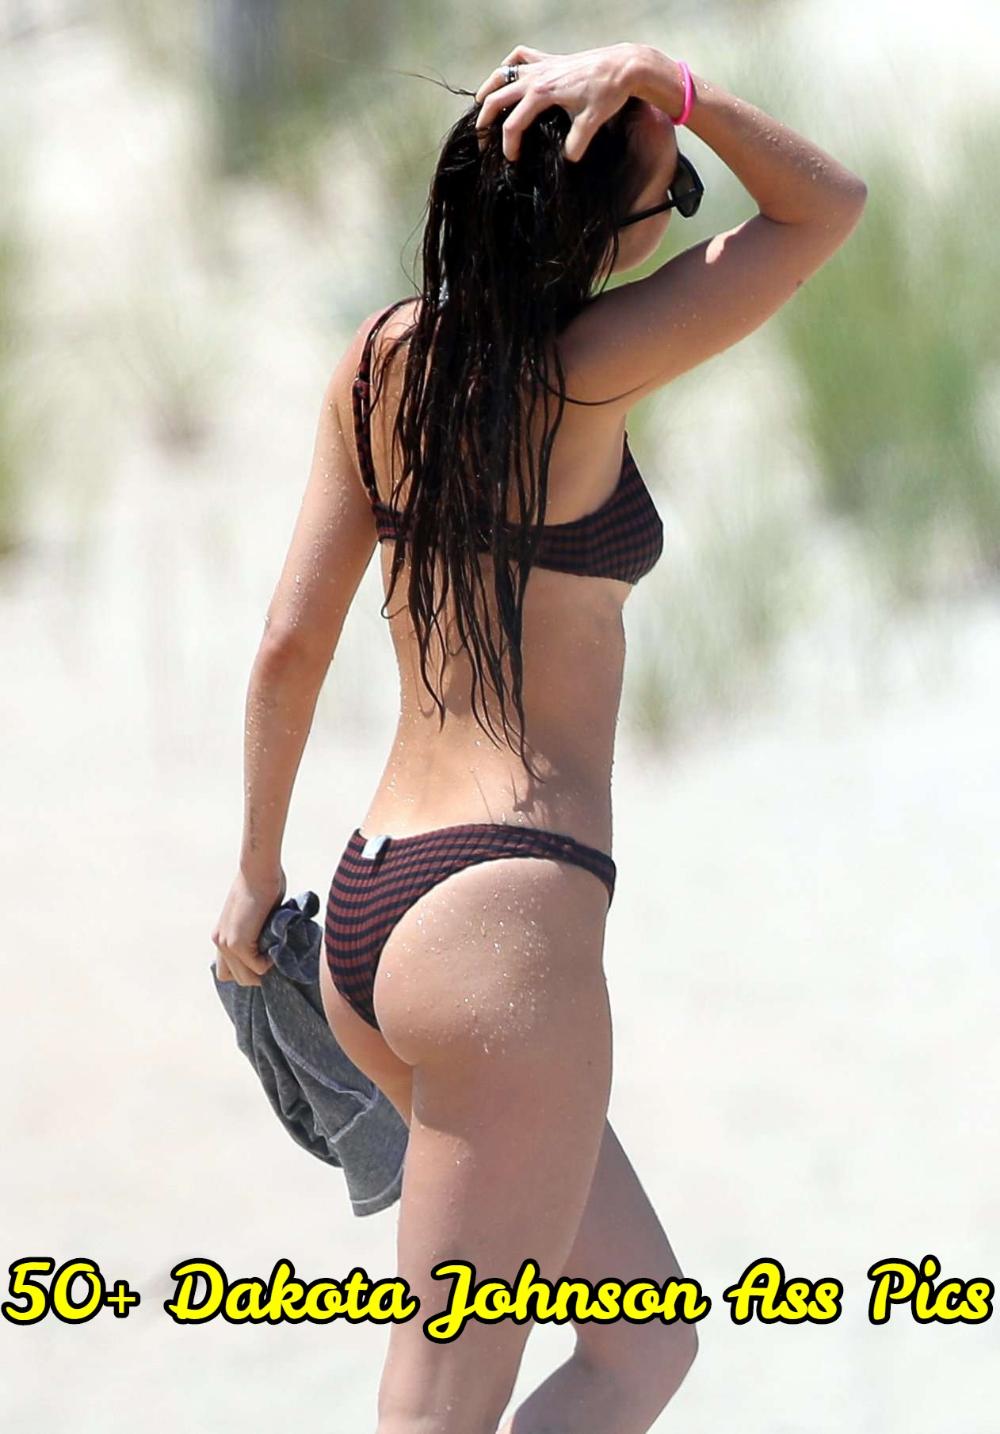 Dakota Johnson Butt